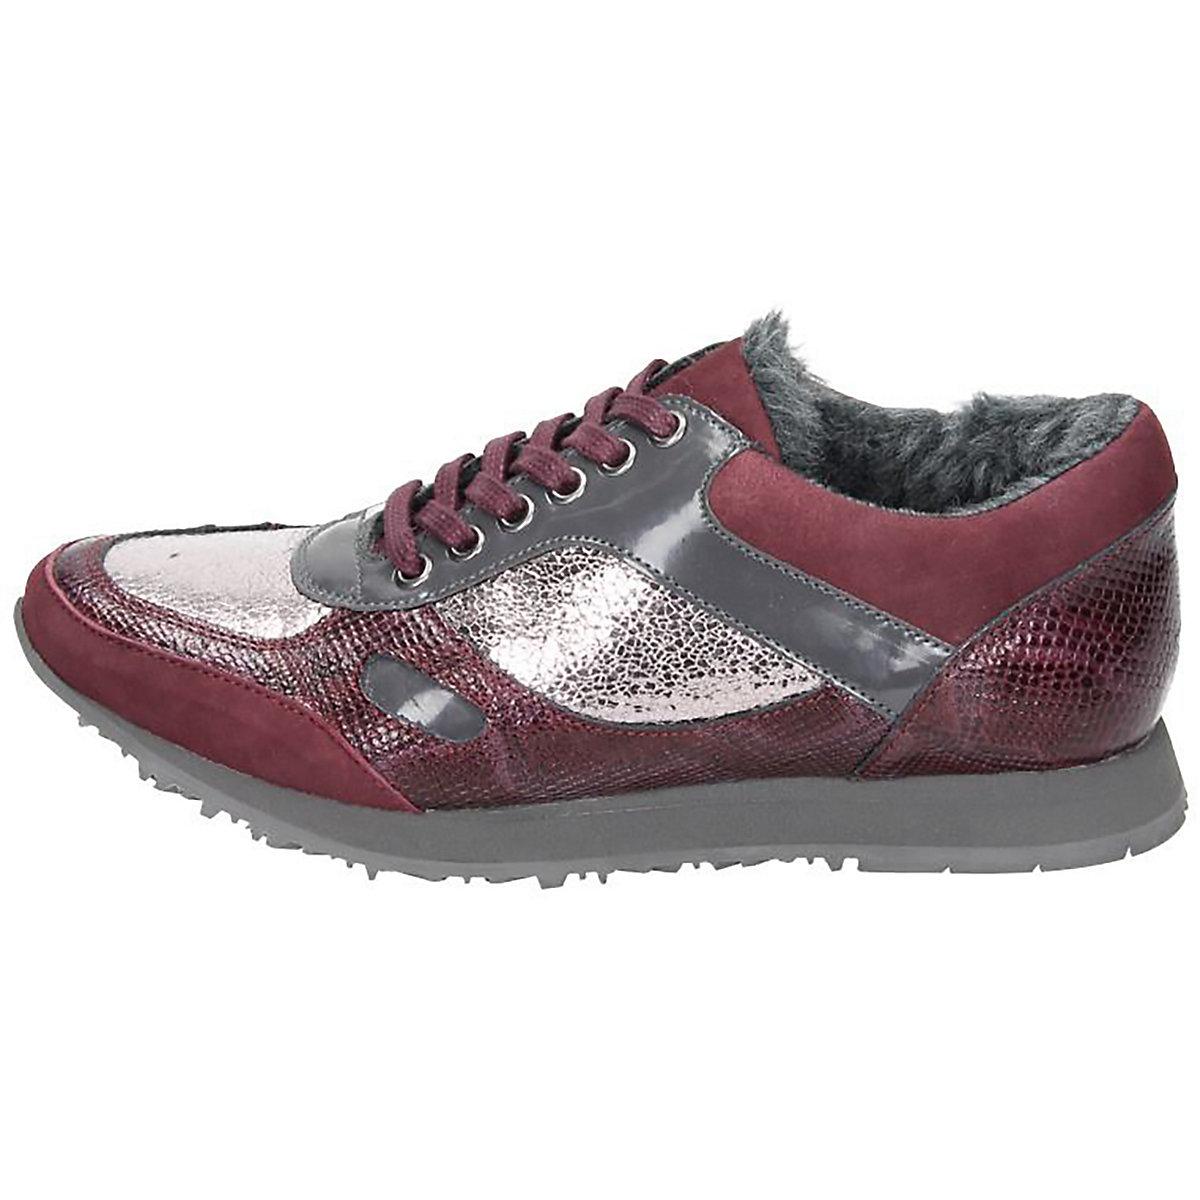 Piazza, Piazza Damen Sneaker Sneakers Low, Rot